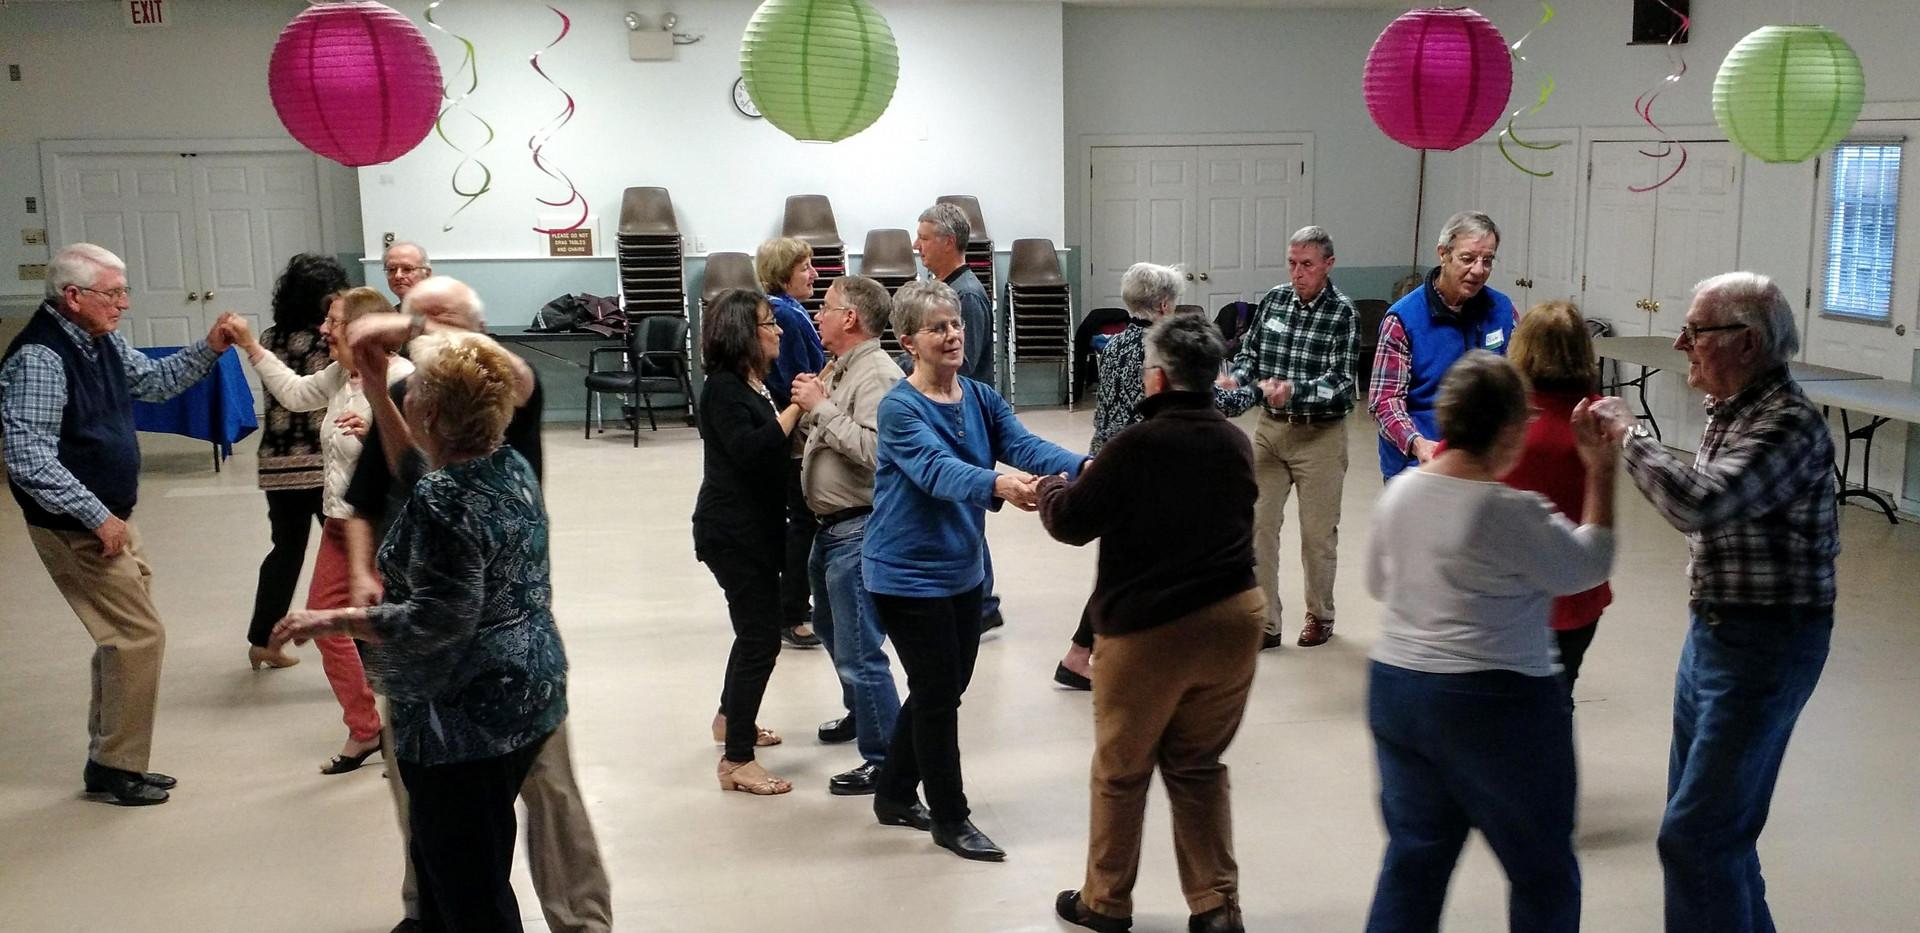 Cape Sands Ballroom Partner Dancing